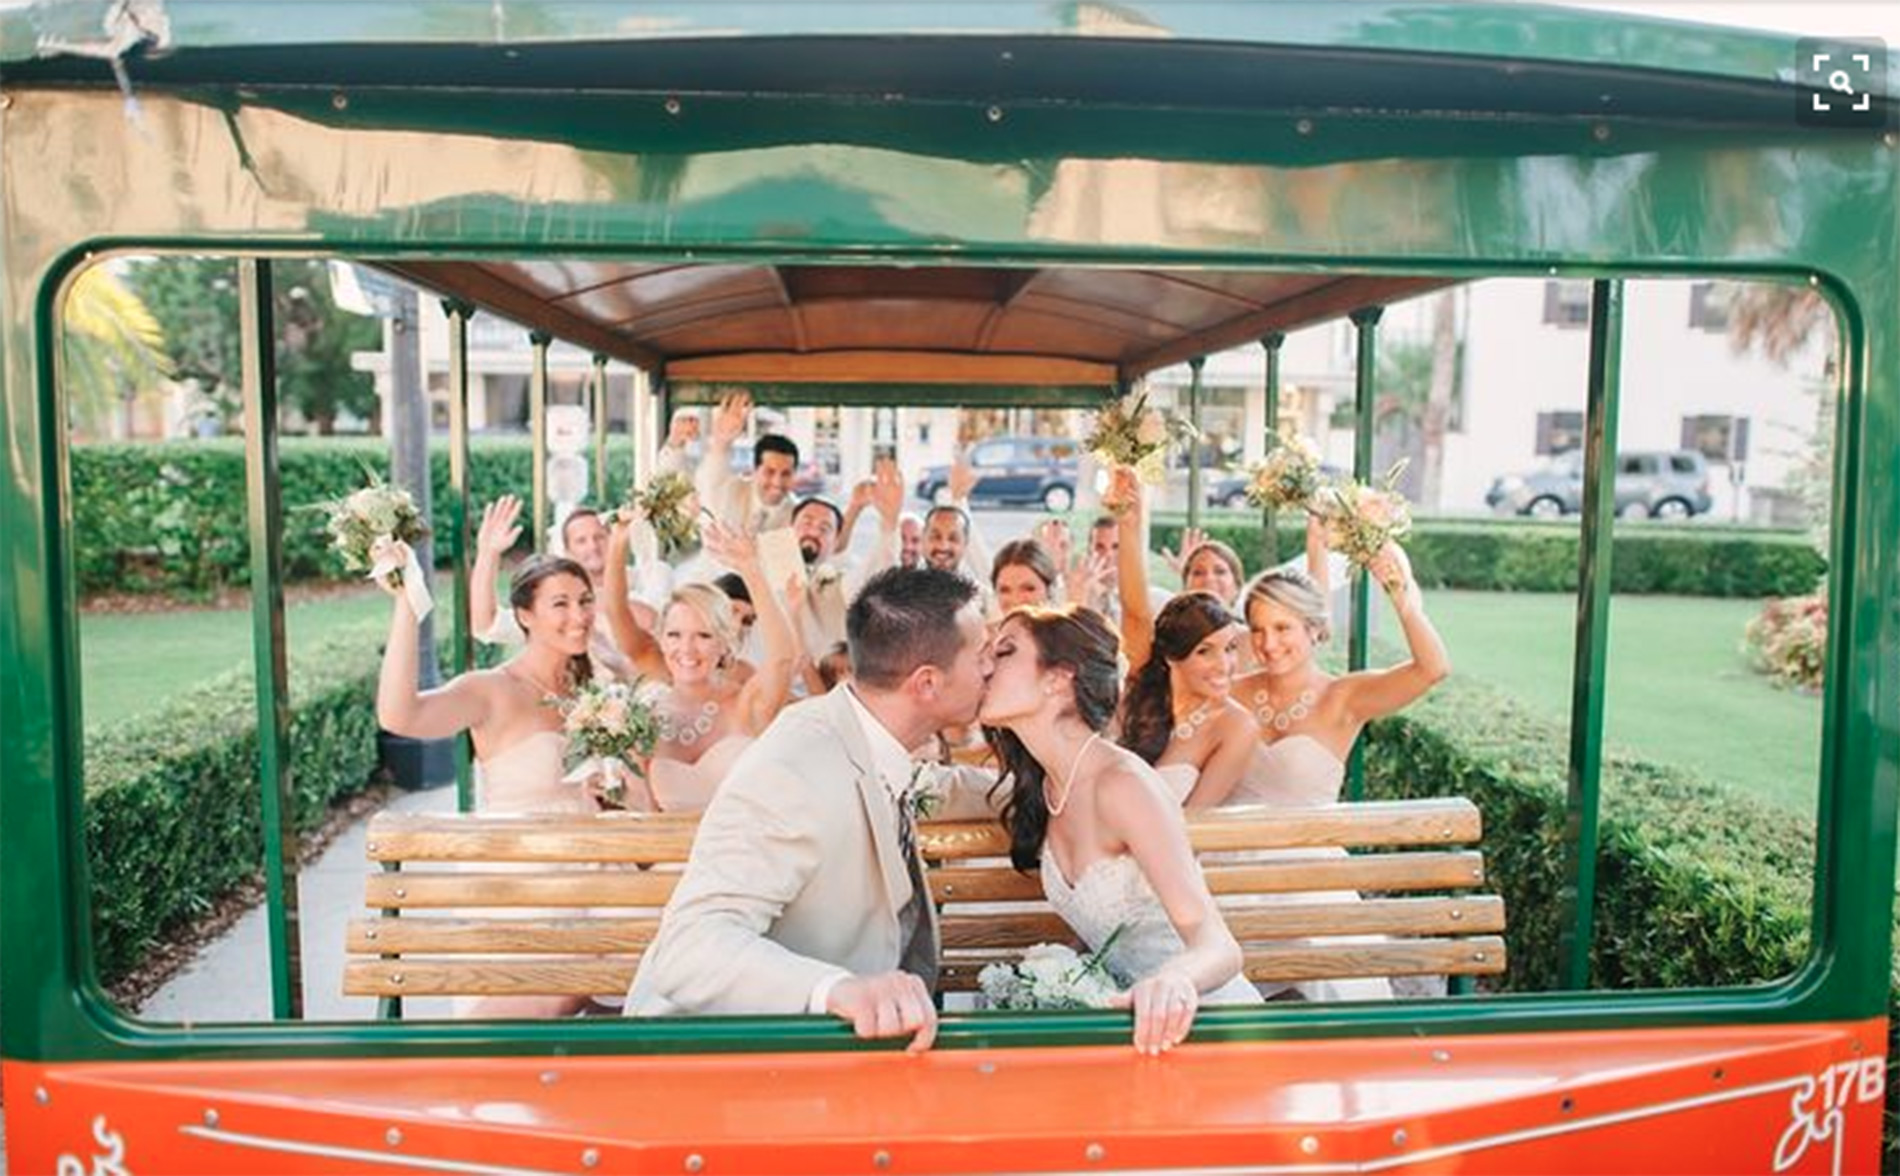 St-Augustine-Wedding-Venues-White-Room-Ballroom-Wedding-Historic-Downtown-trolley